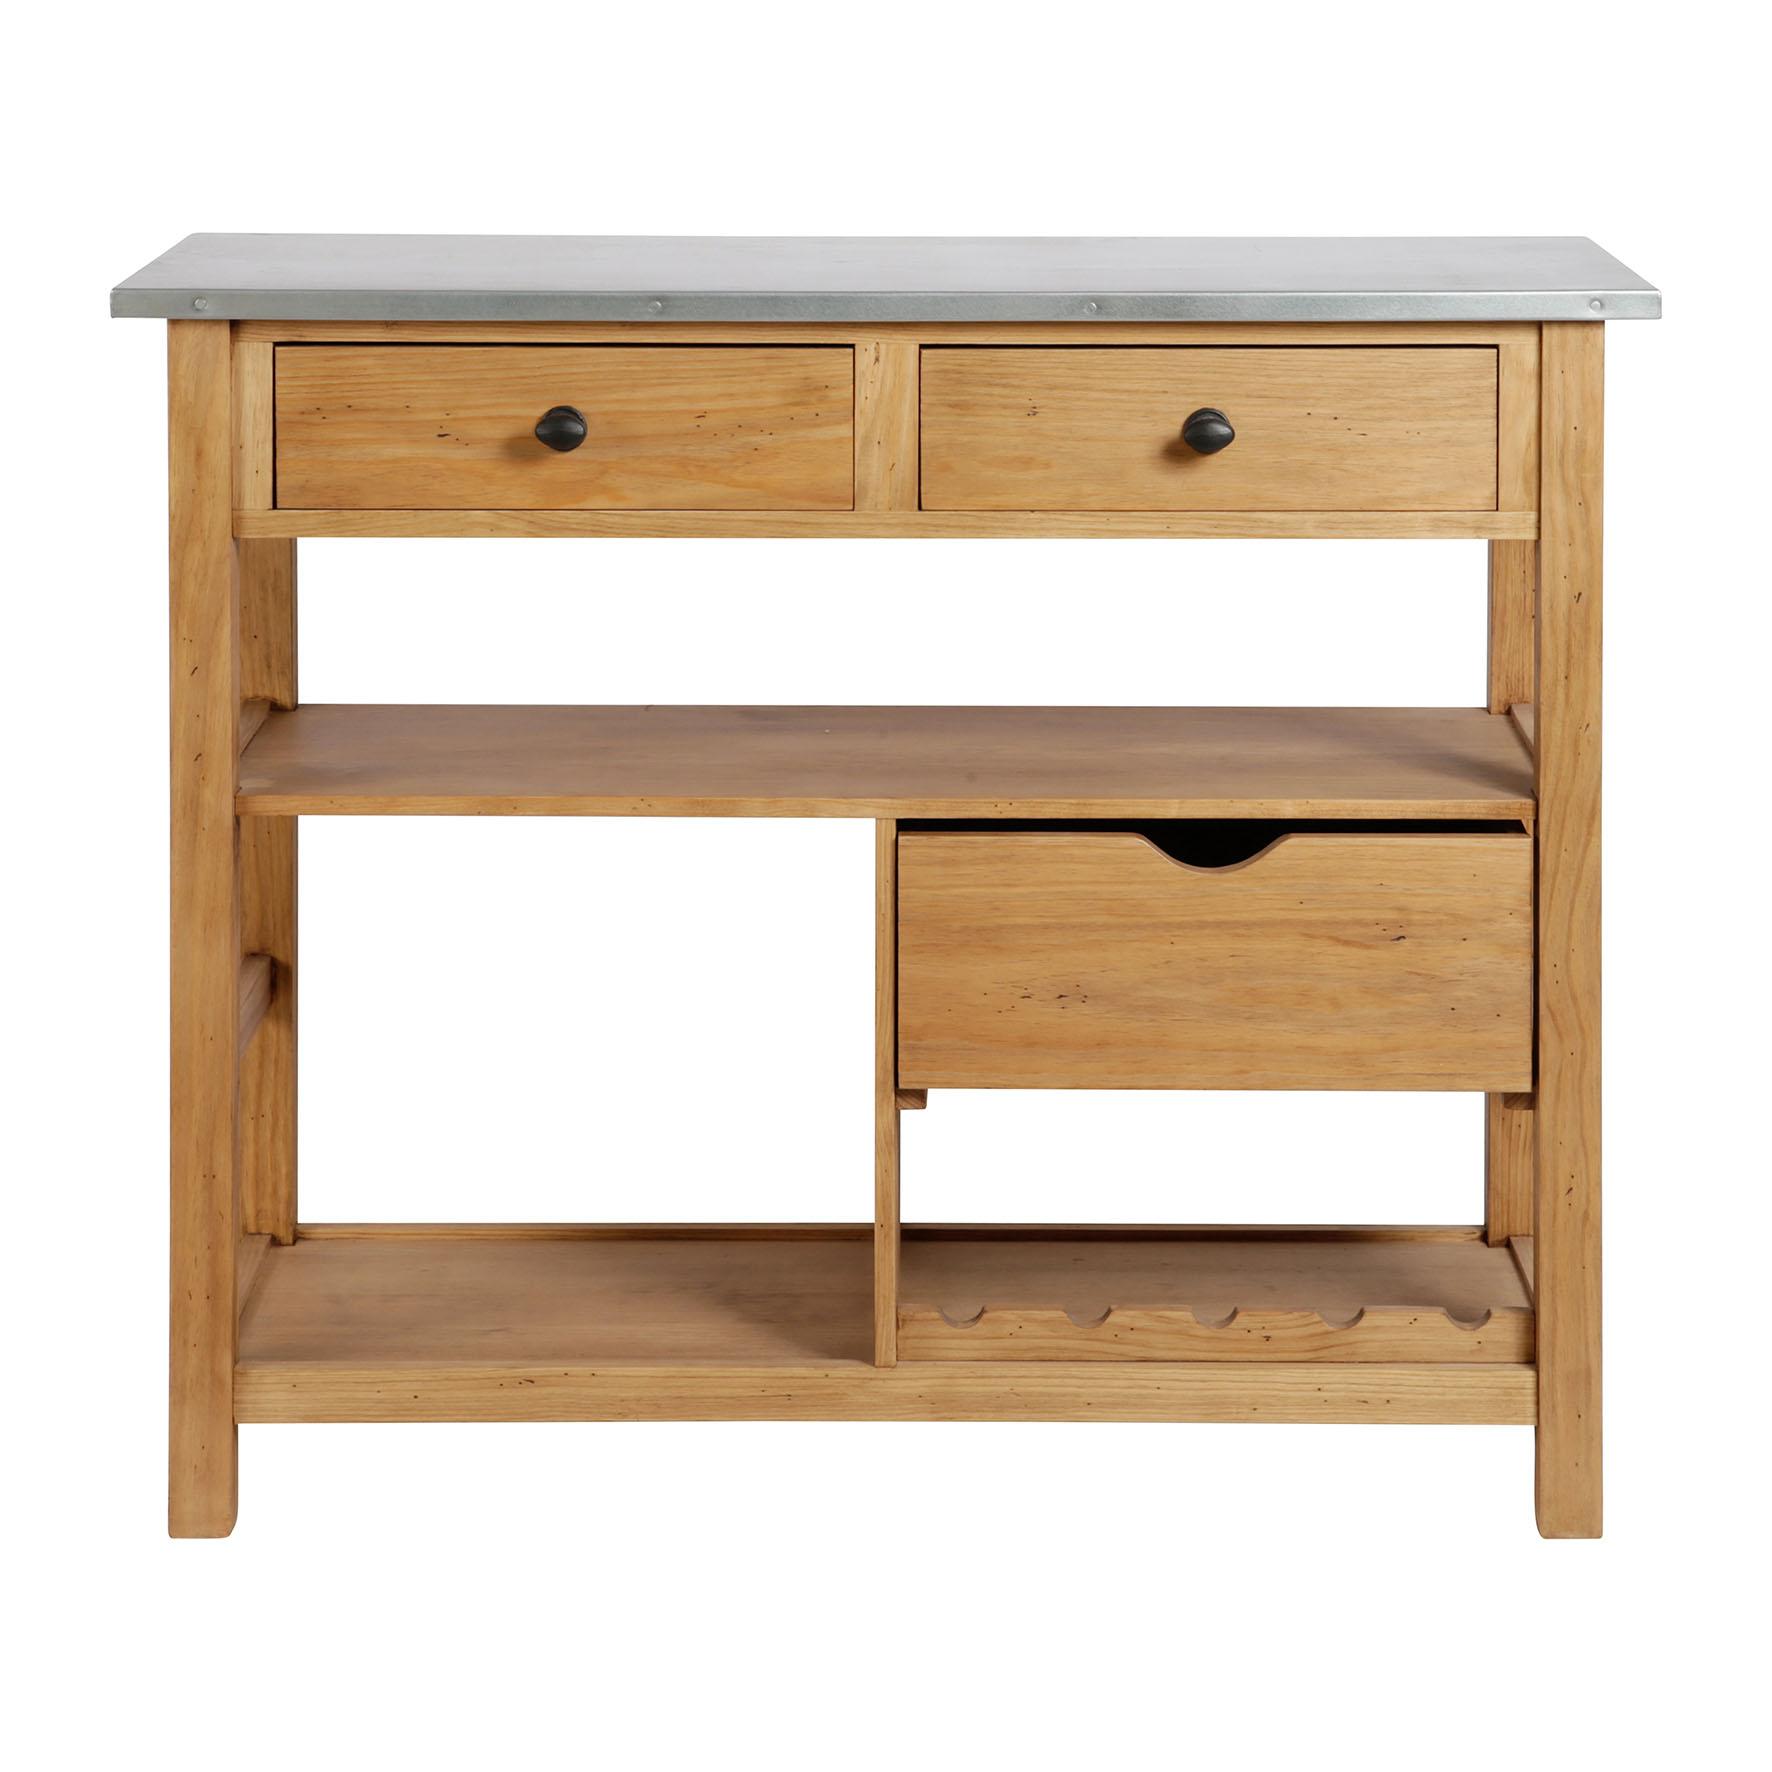 ilot de cuisine billot terroir comptoir de famille. Black Bedroom Furniture Sets. Home Design Ideas